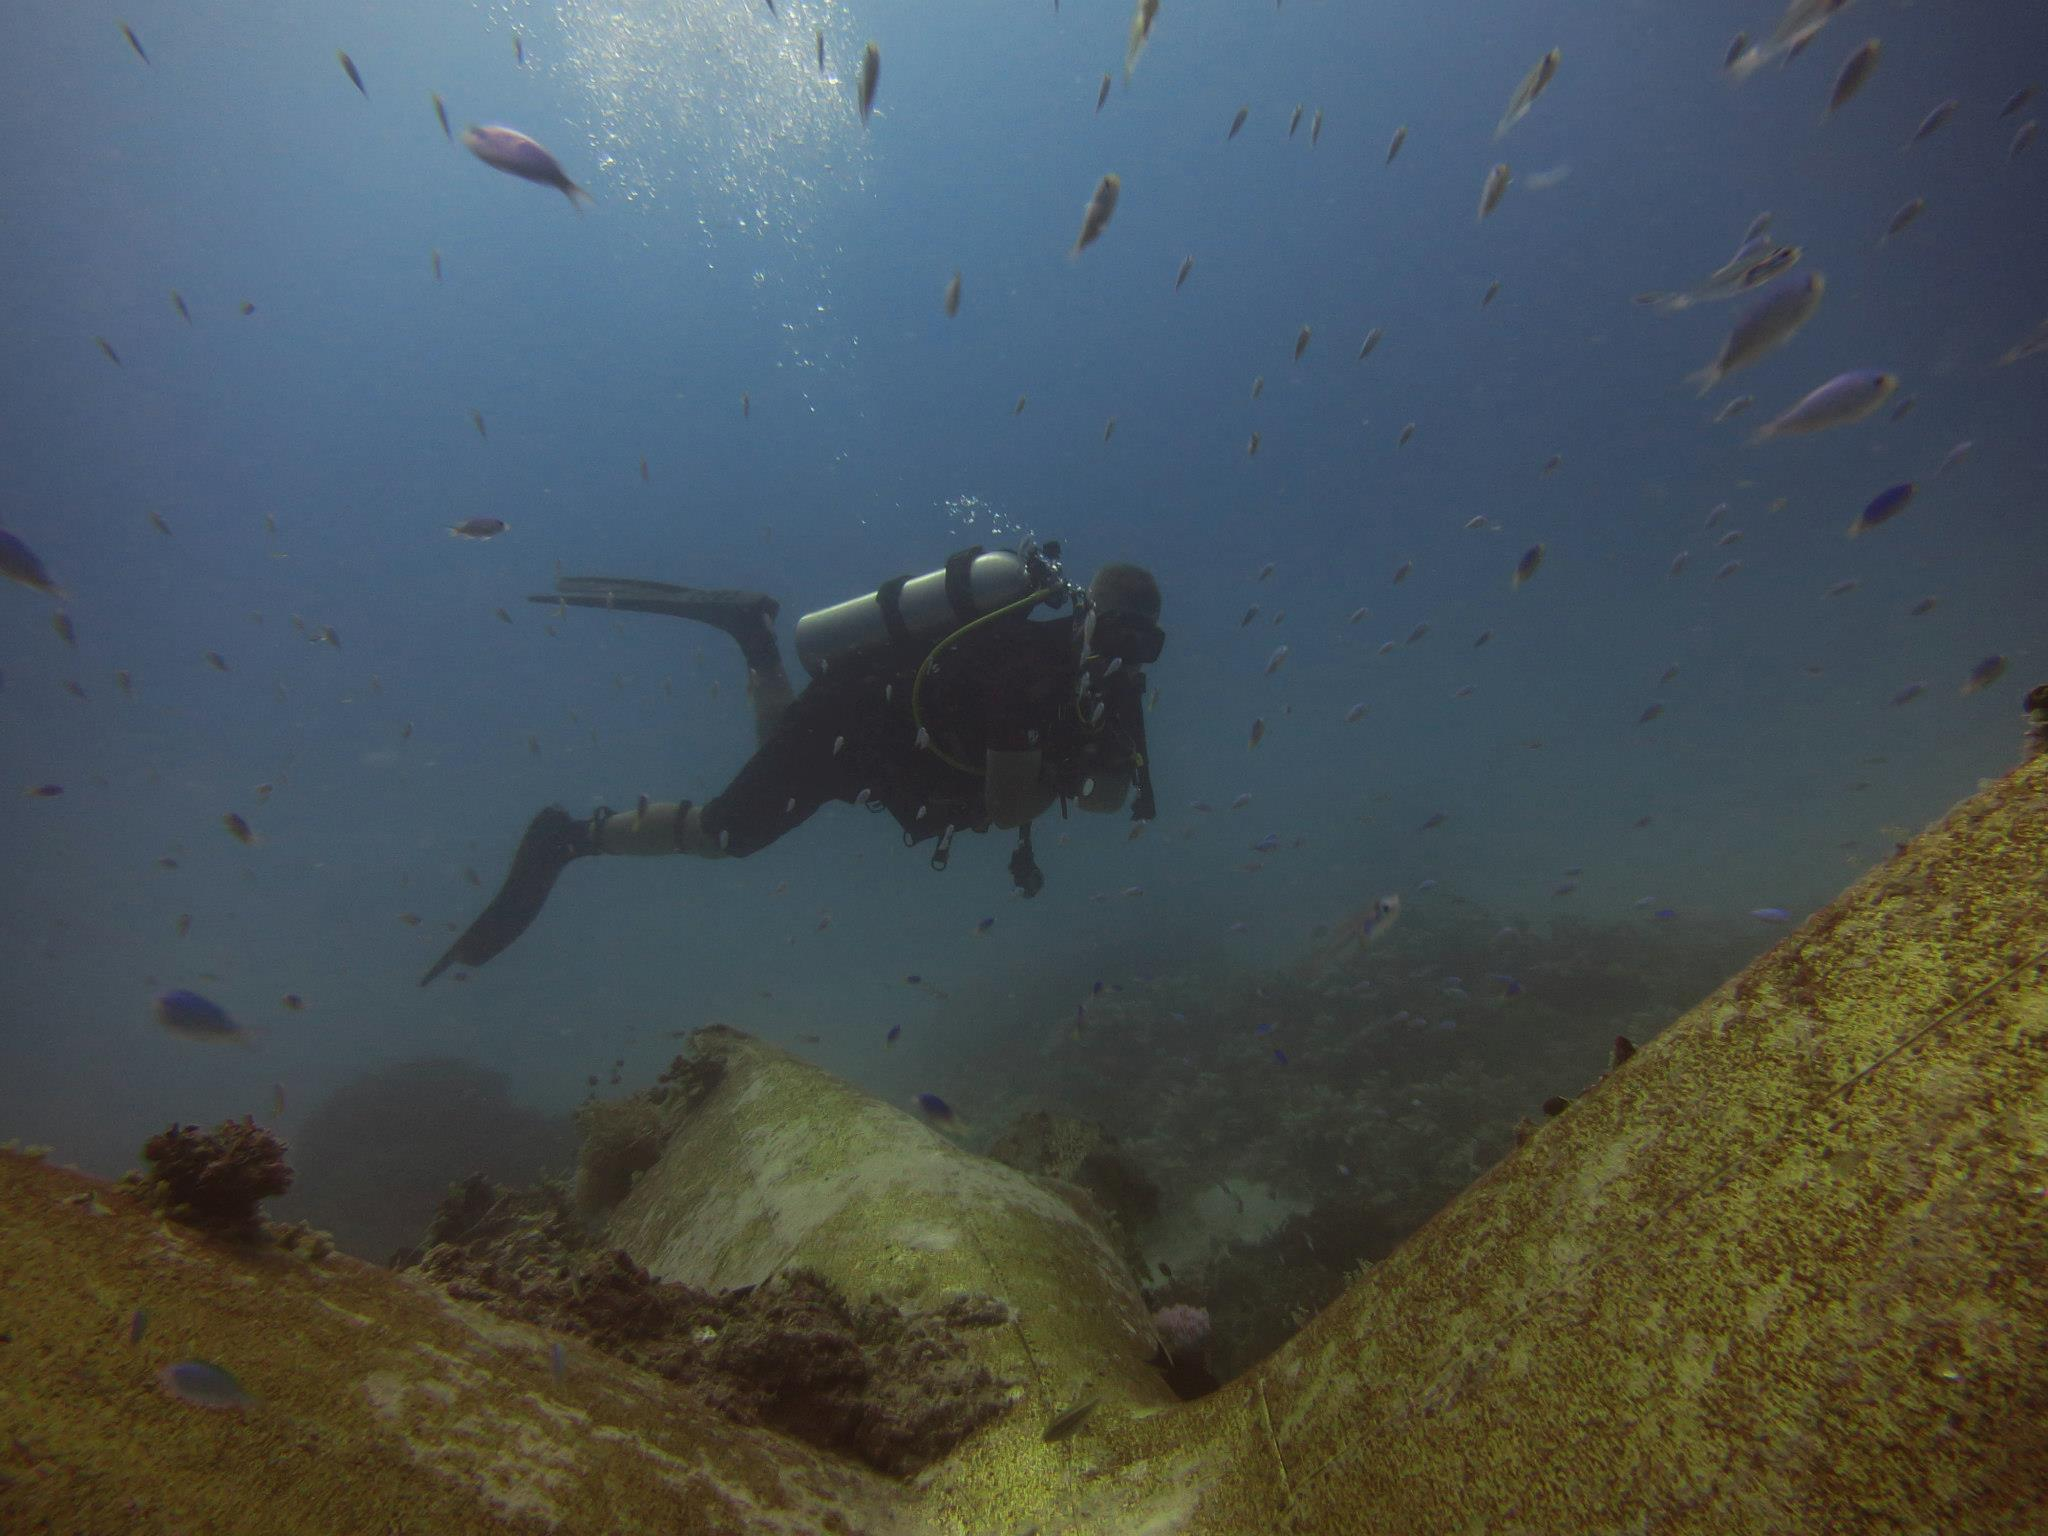 Dan Farnham examing a Japanese Zero fighter aircraft wreck in Kwajalein